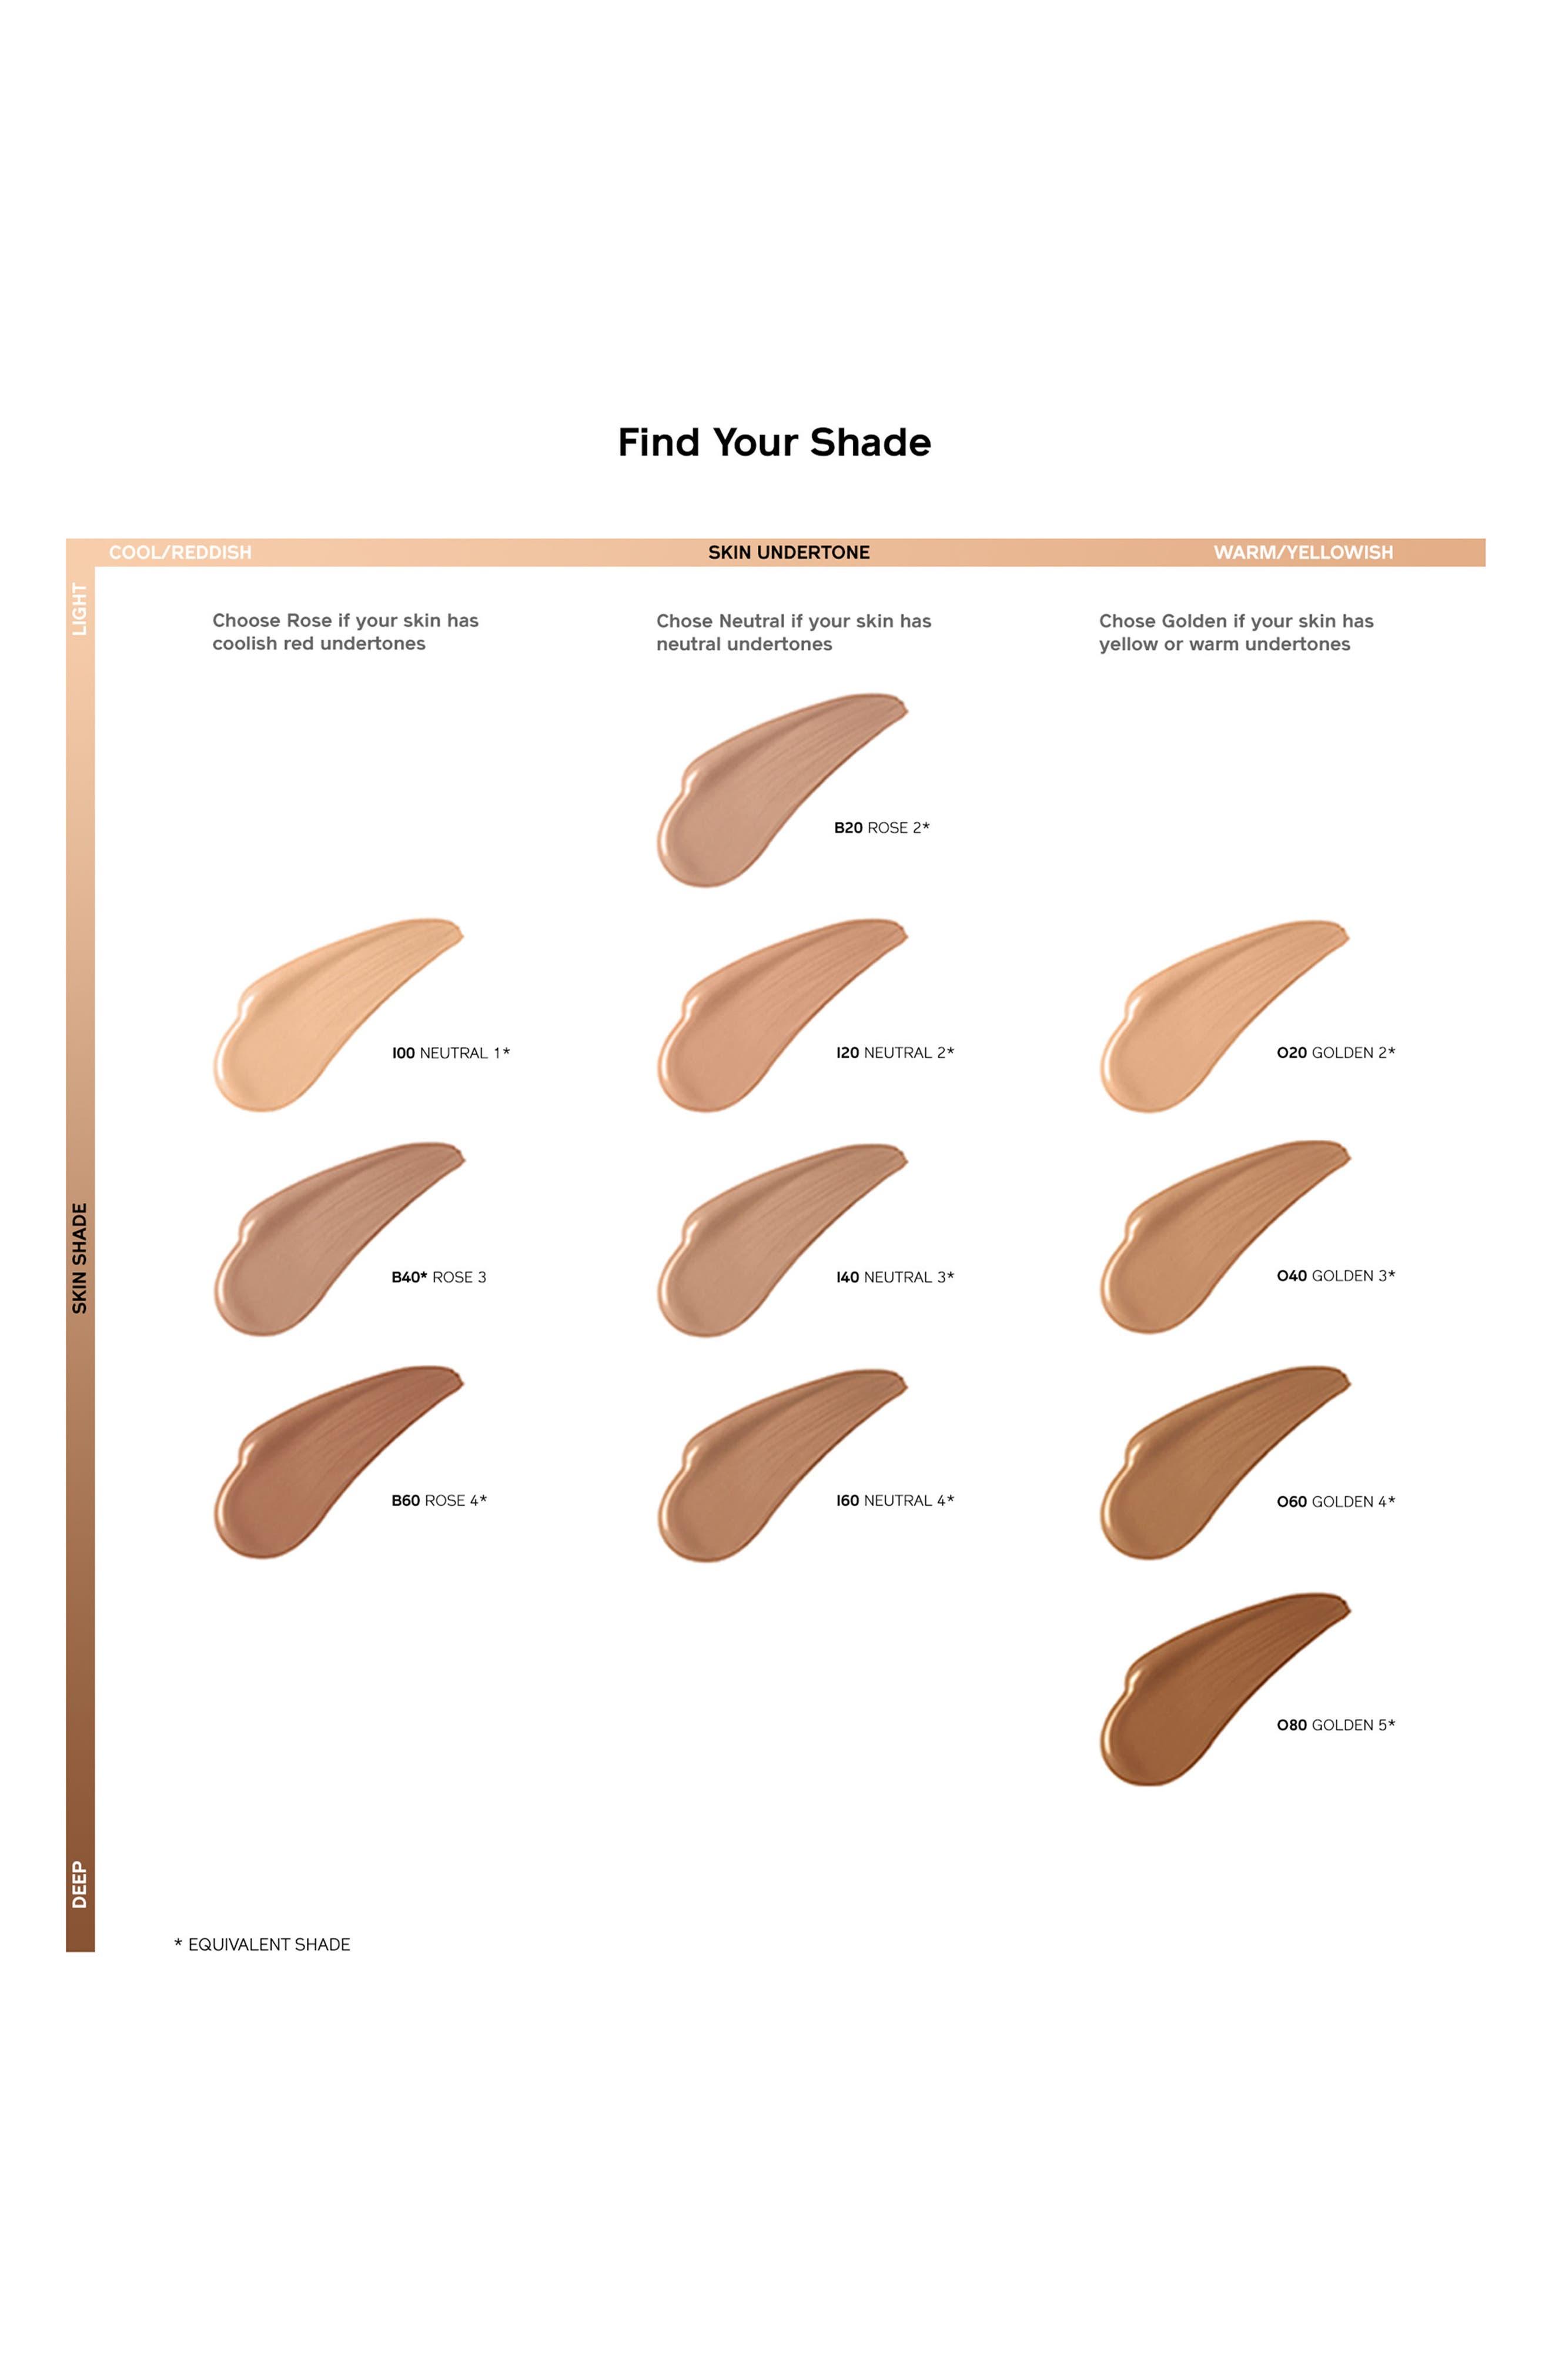 Synchro Skin Lasting Liquid Foundation Broad Spectrum SPF 20,                             Main thumbnail 1, color,                             NEUTRAL 1